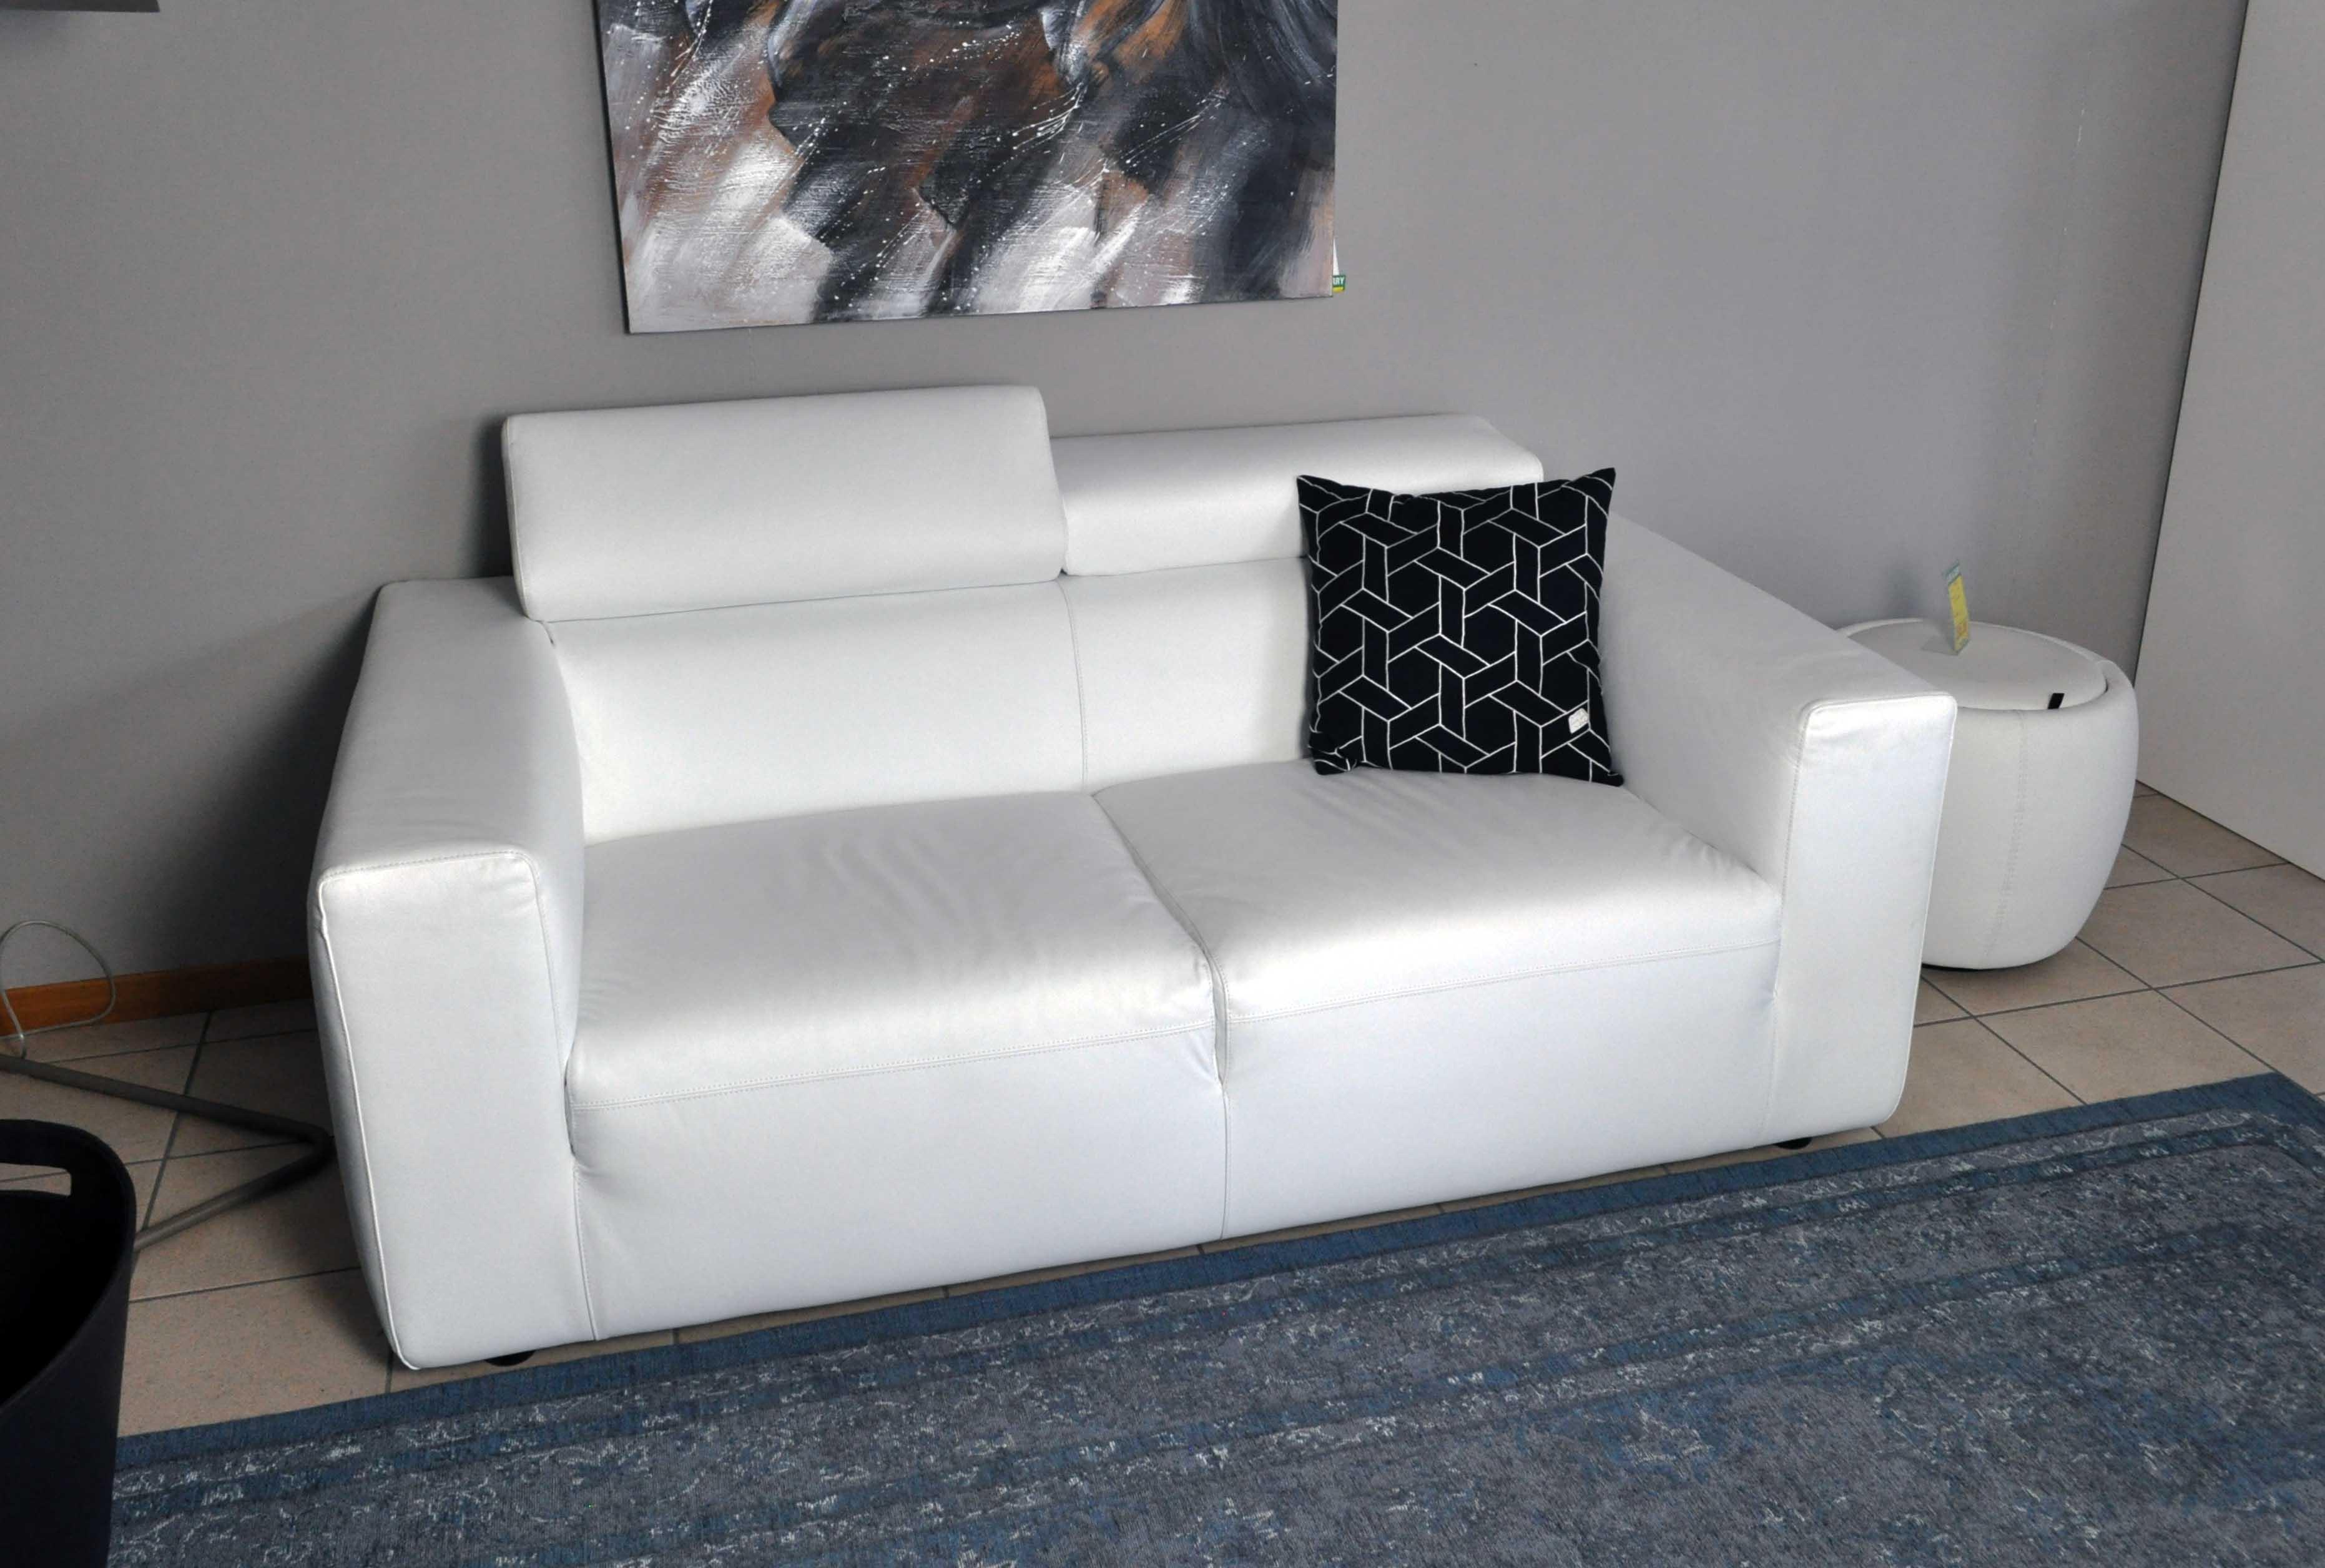 Calligaris divano Upgrade in vera pelle bianco sottocosto - Divani ...